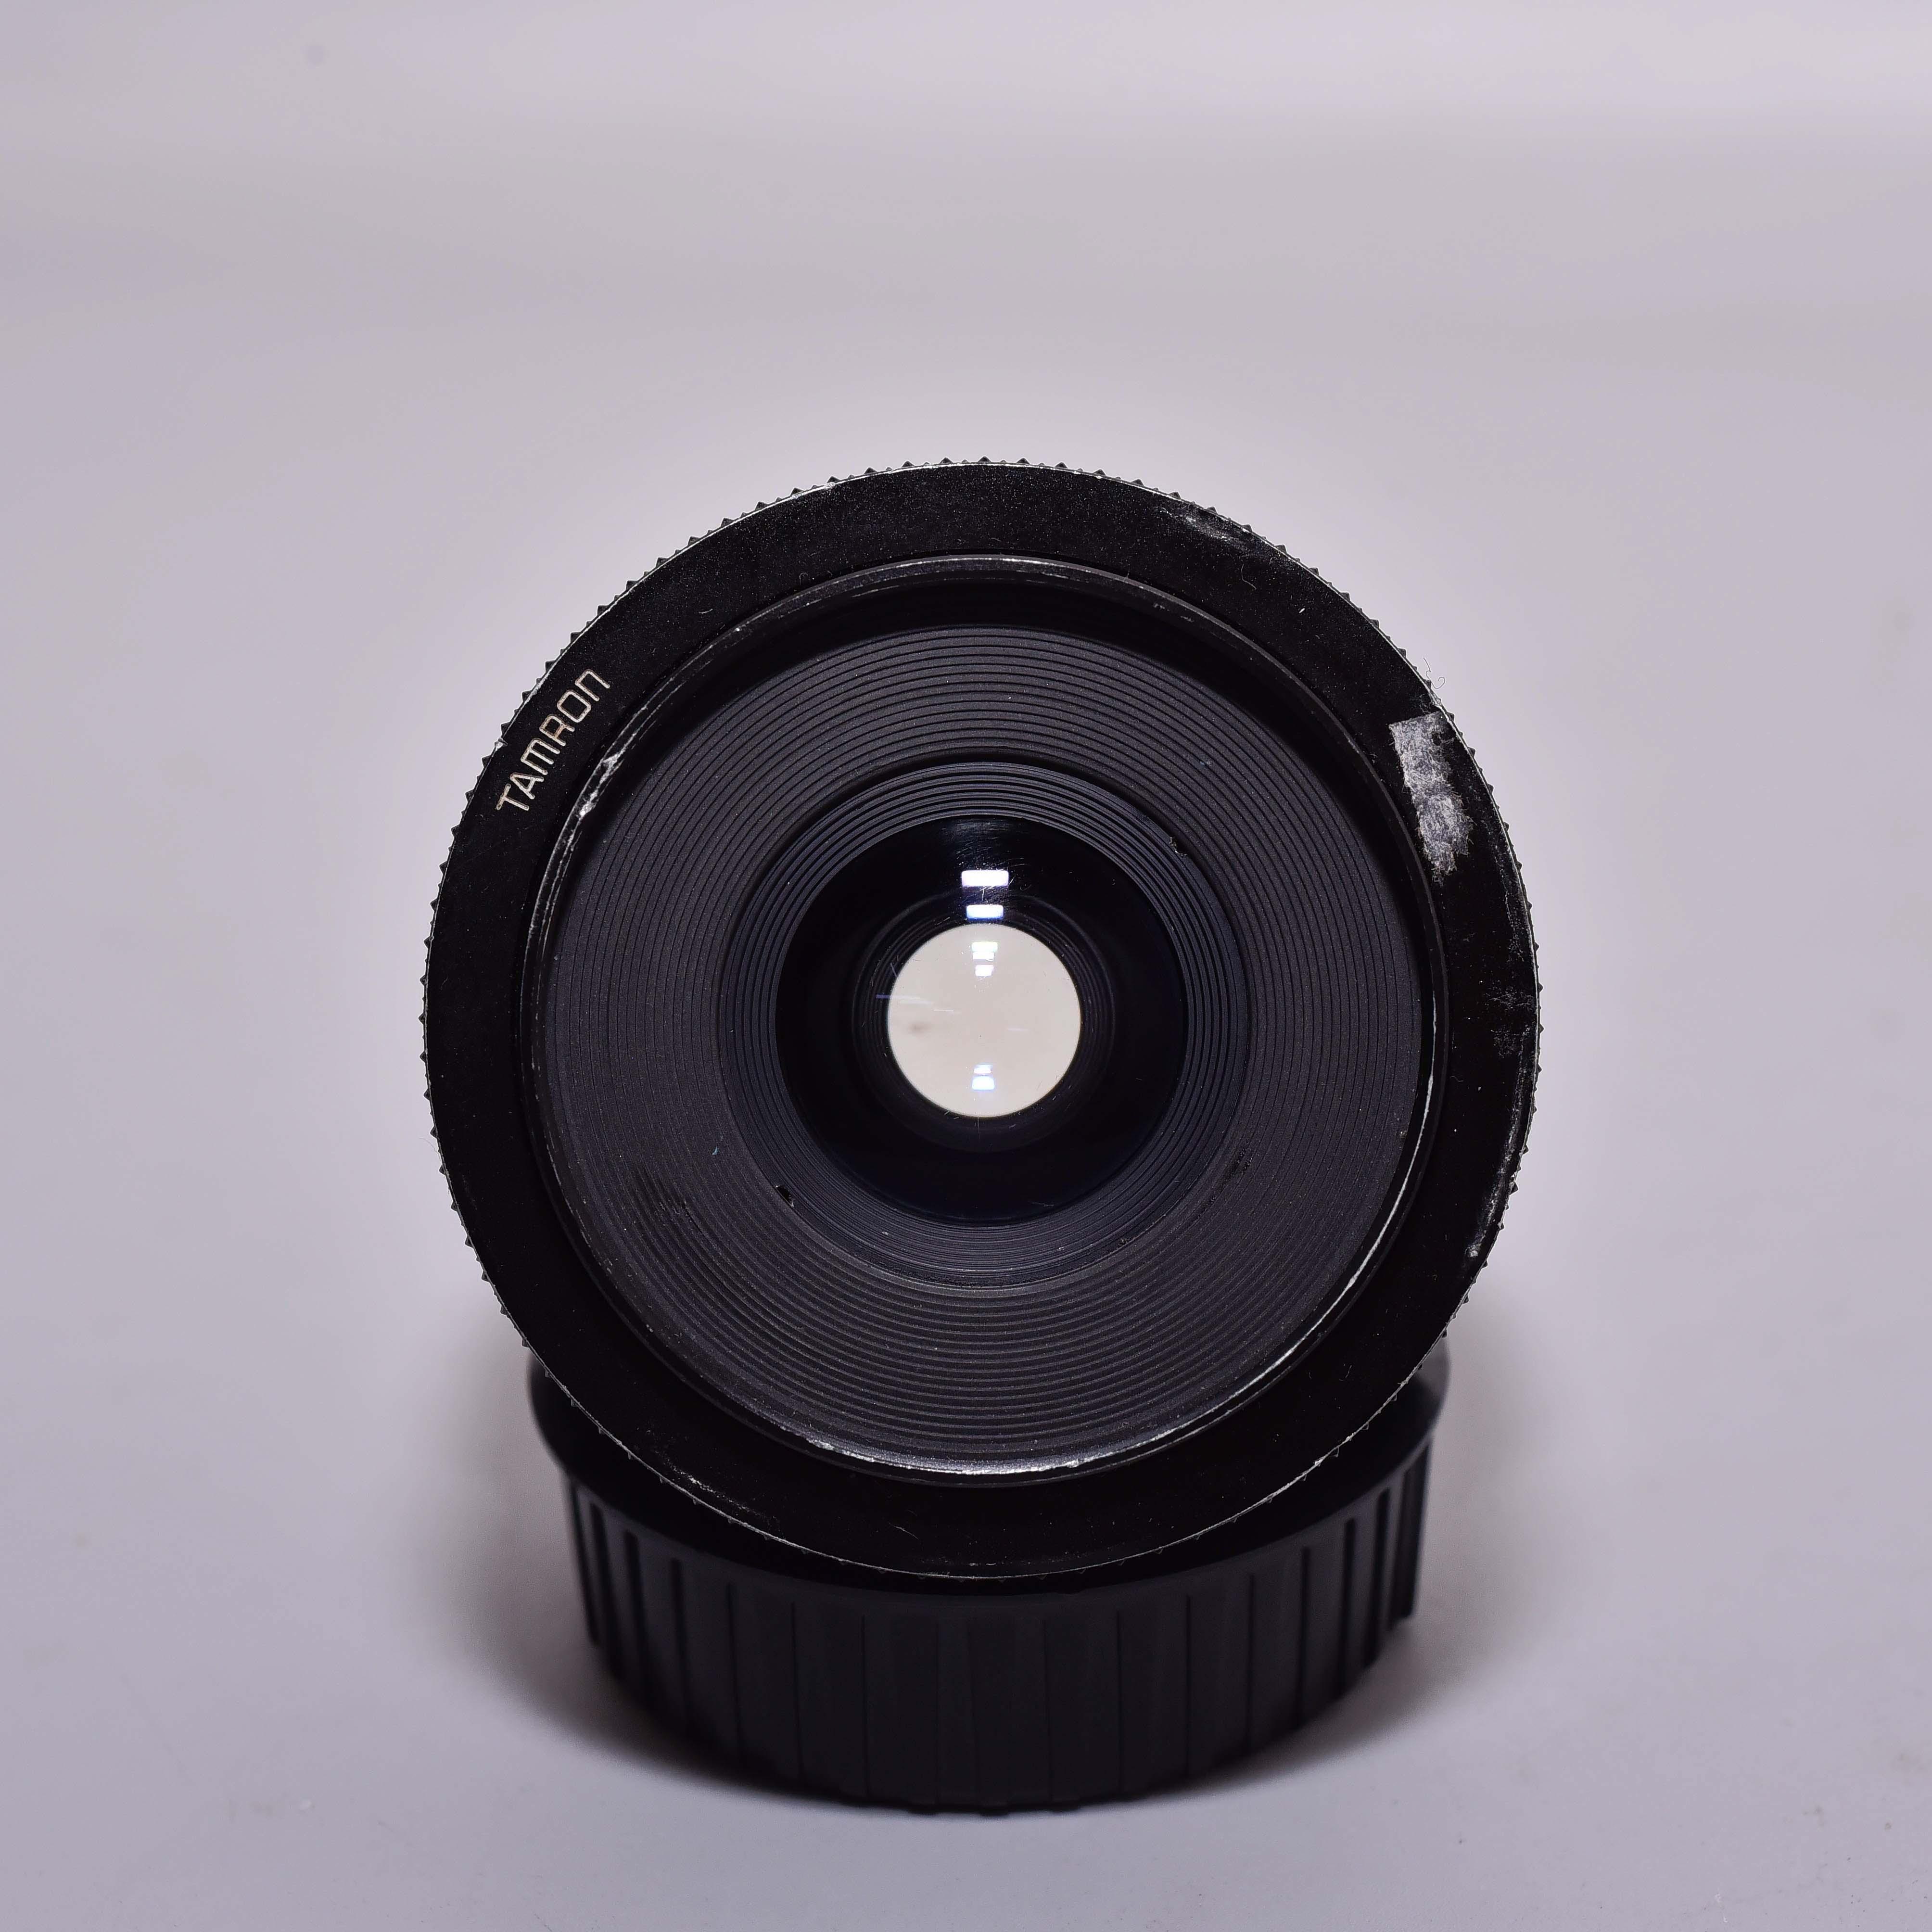 tamron-28mm-f2-5-adaptall-2-28-2-5-10629